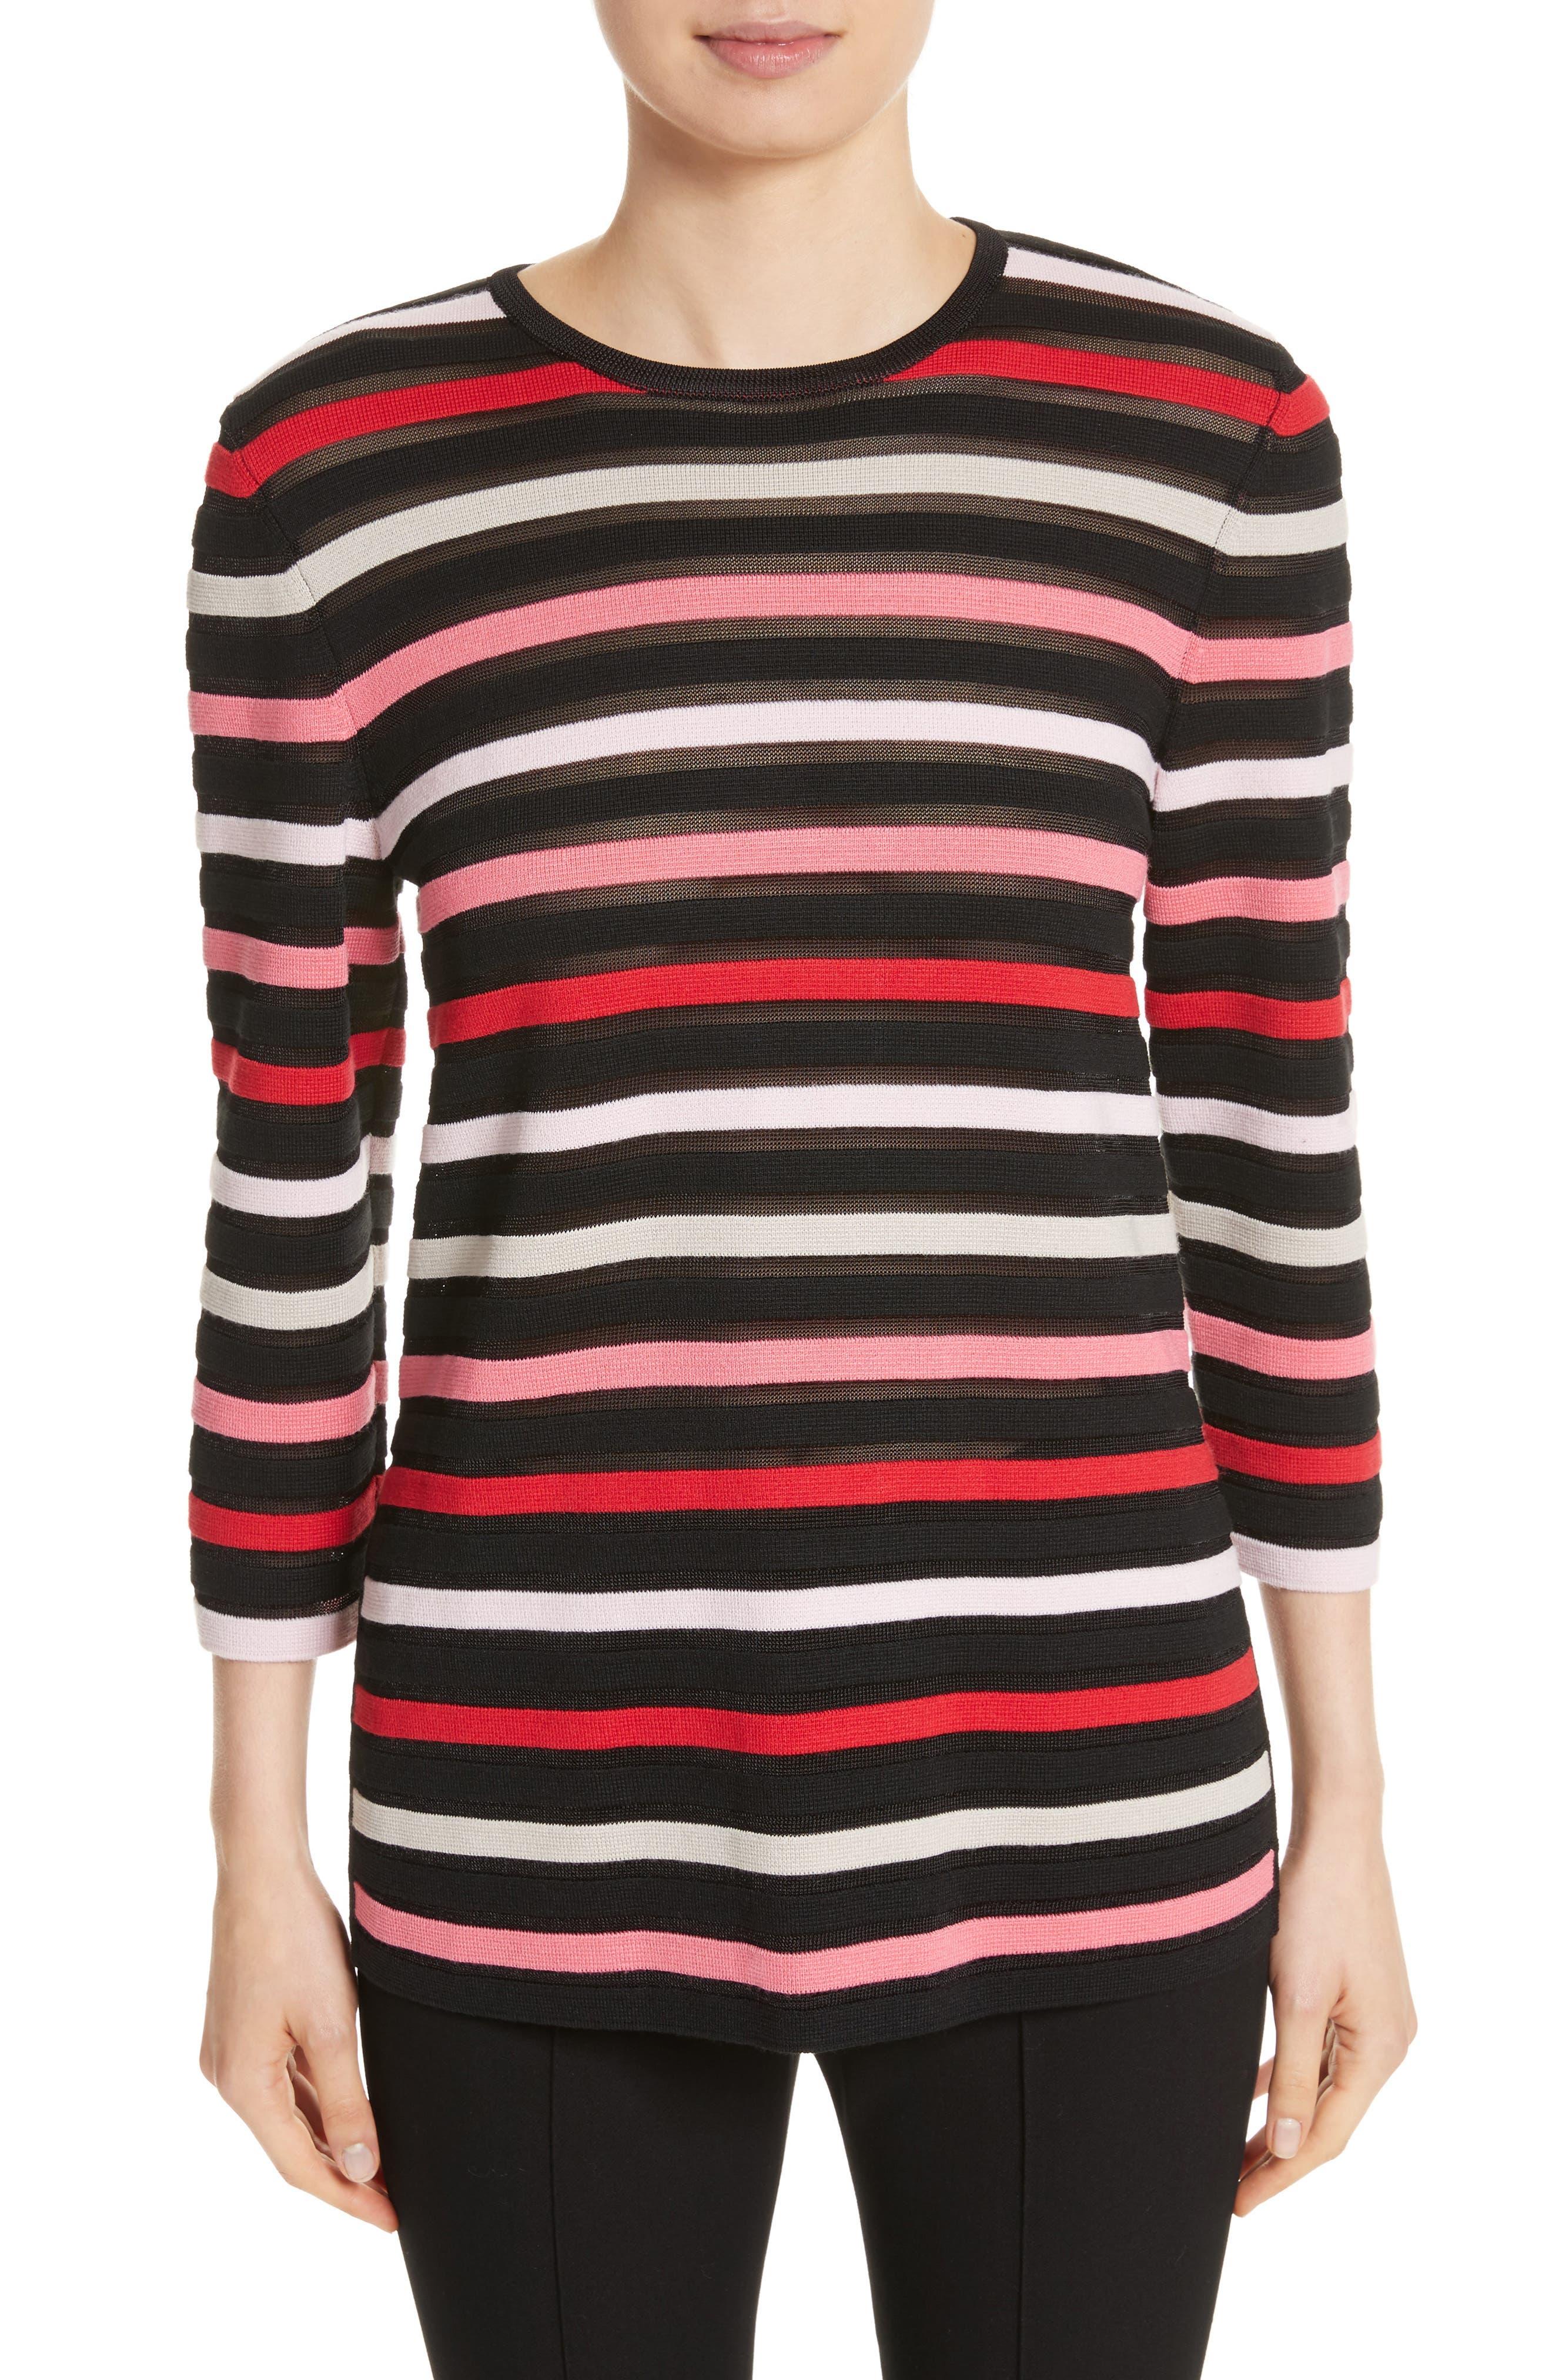 Main Image - St. John Collection Ombré Stripe Sweater